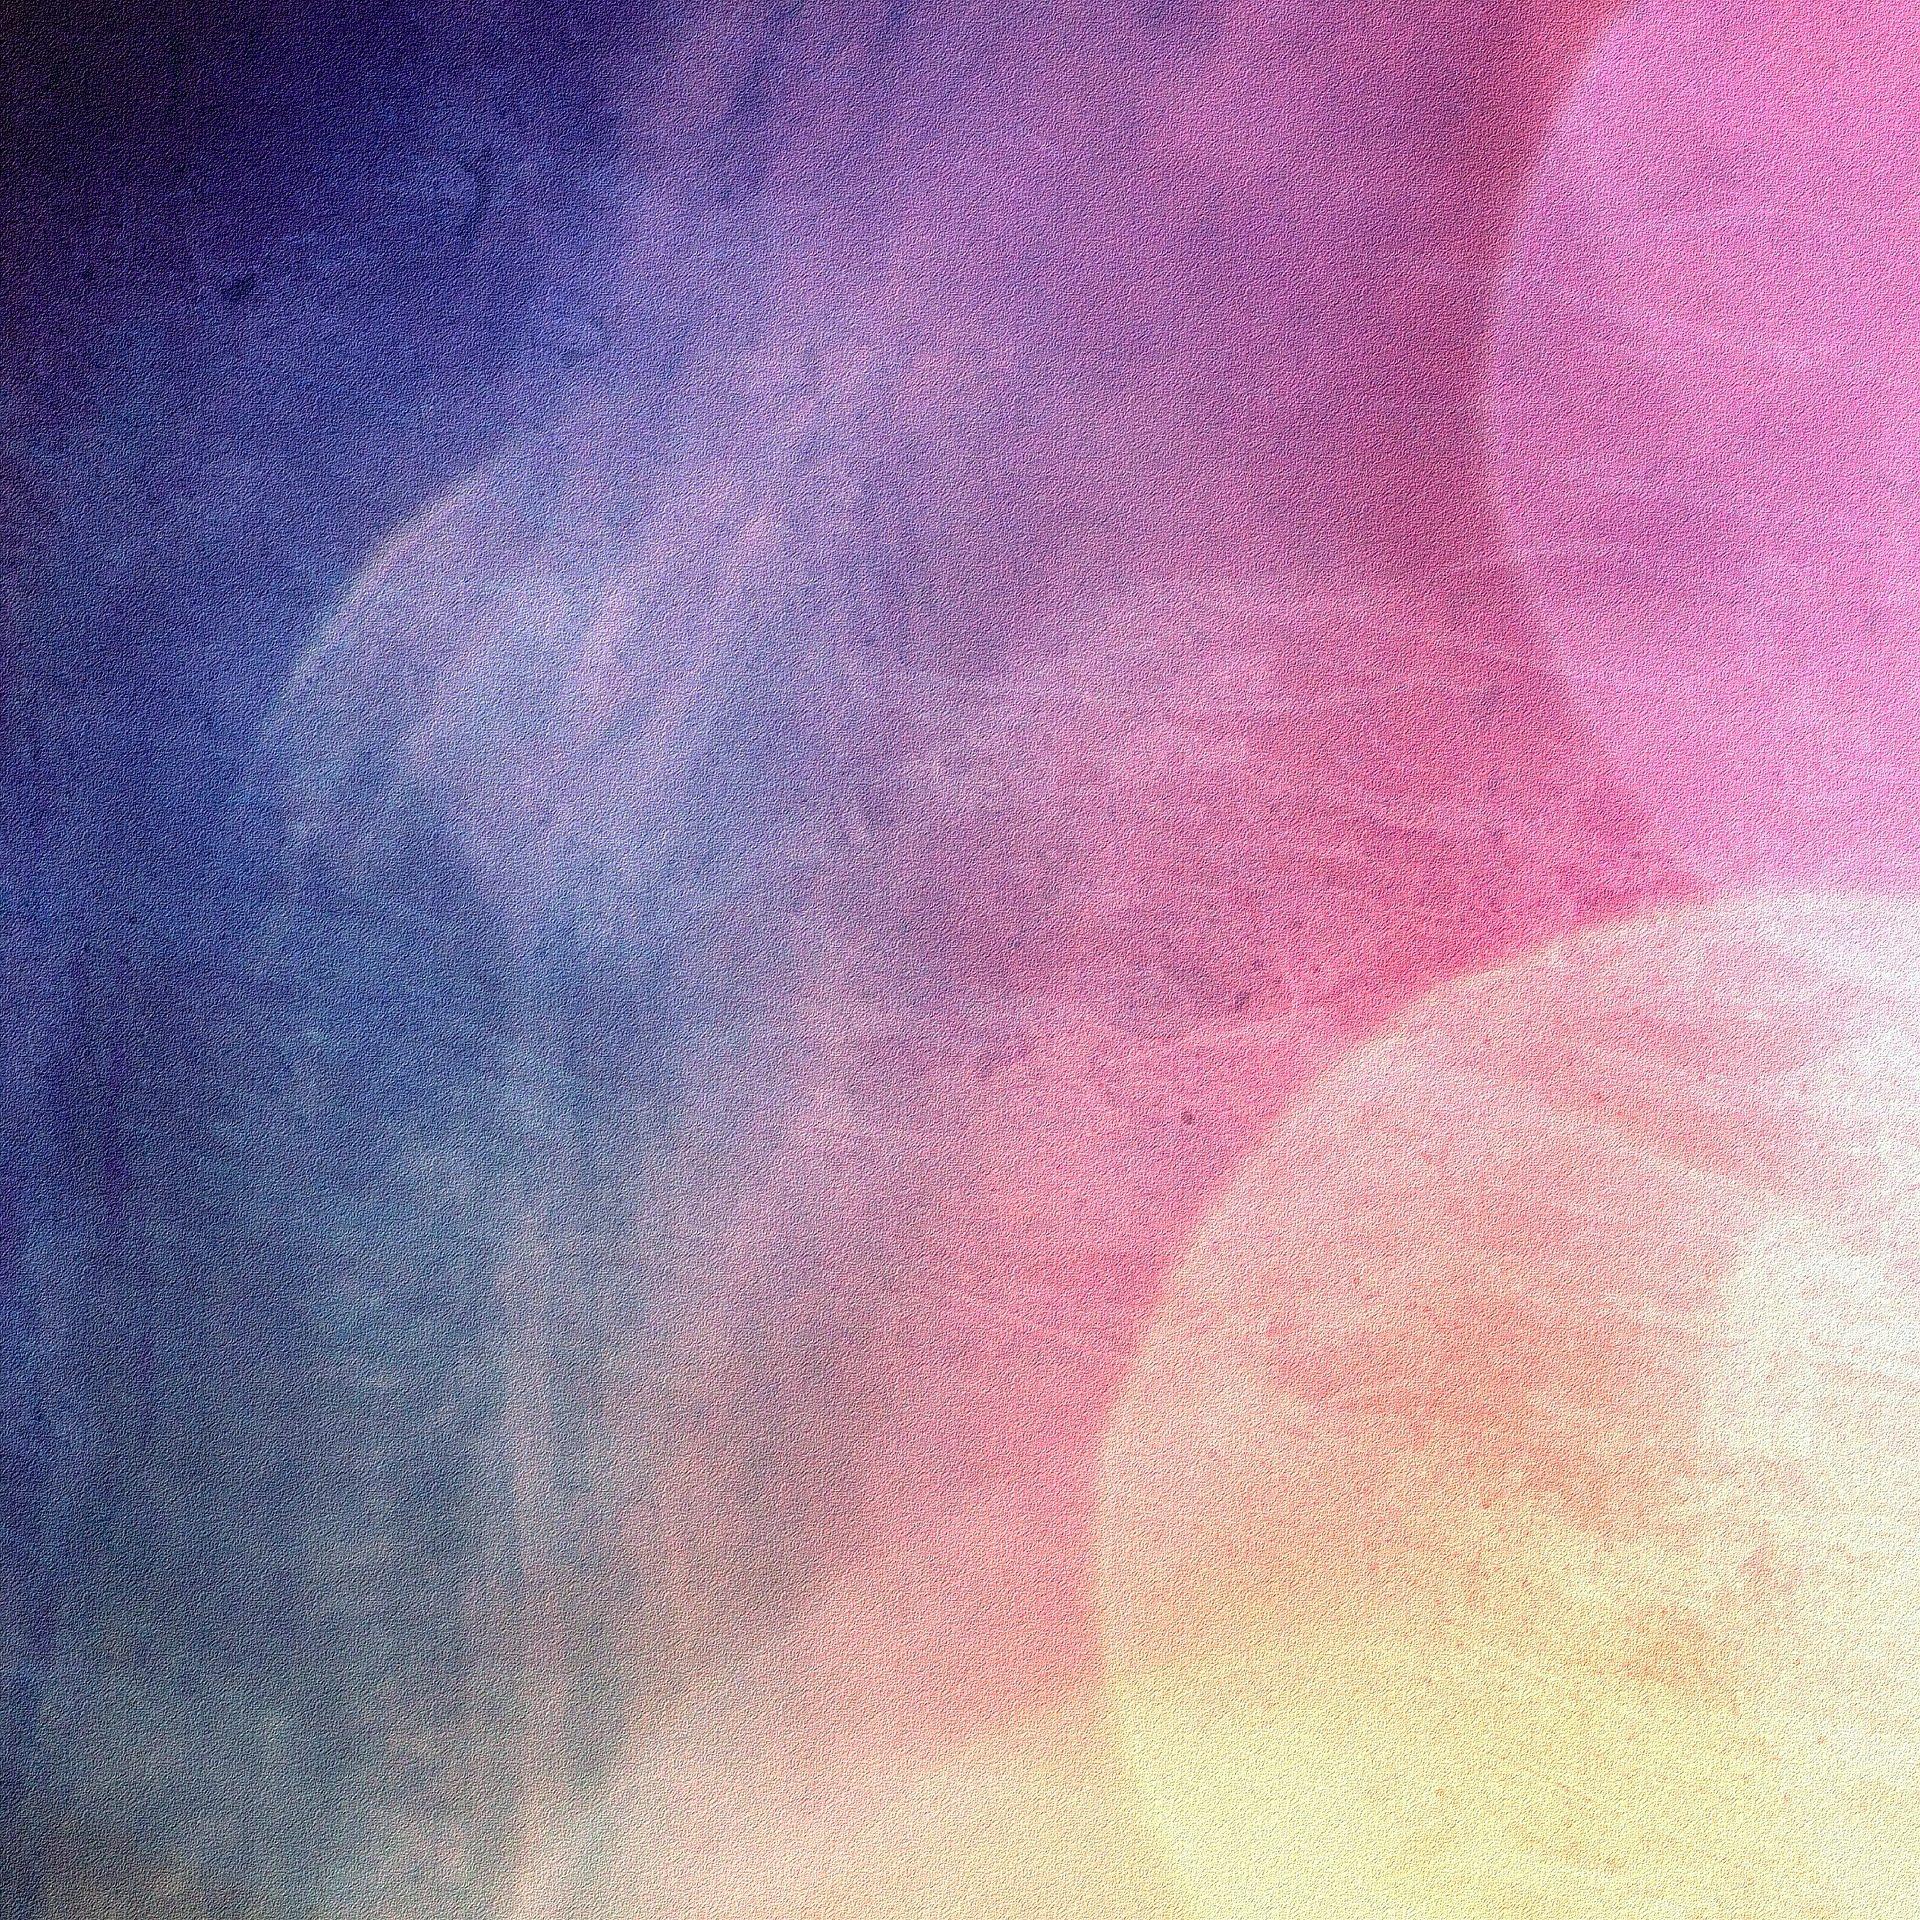 luces, colores, halos, destellos, colorido, 1610181546